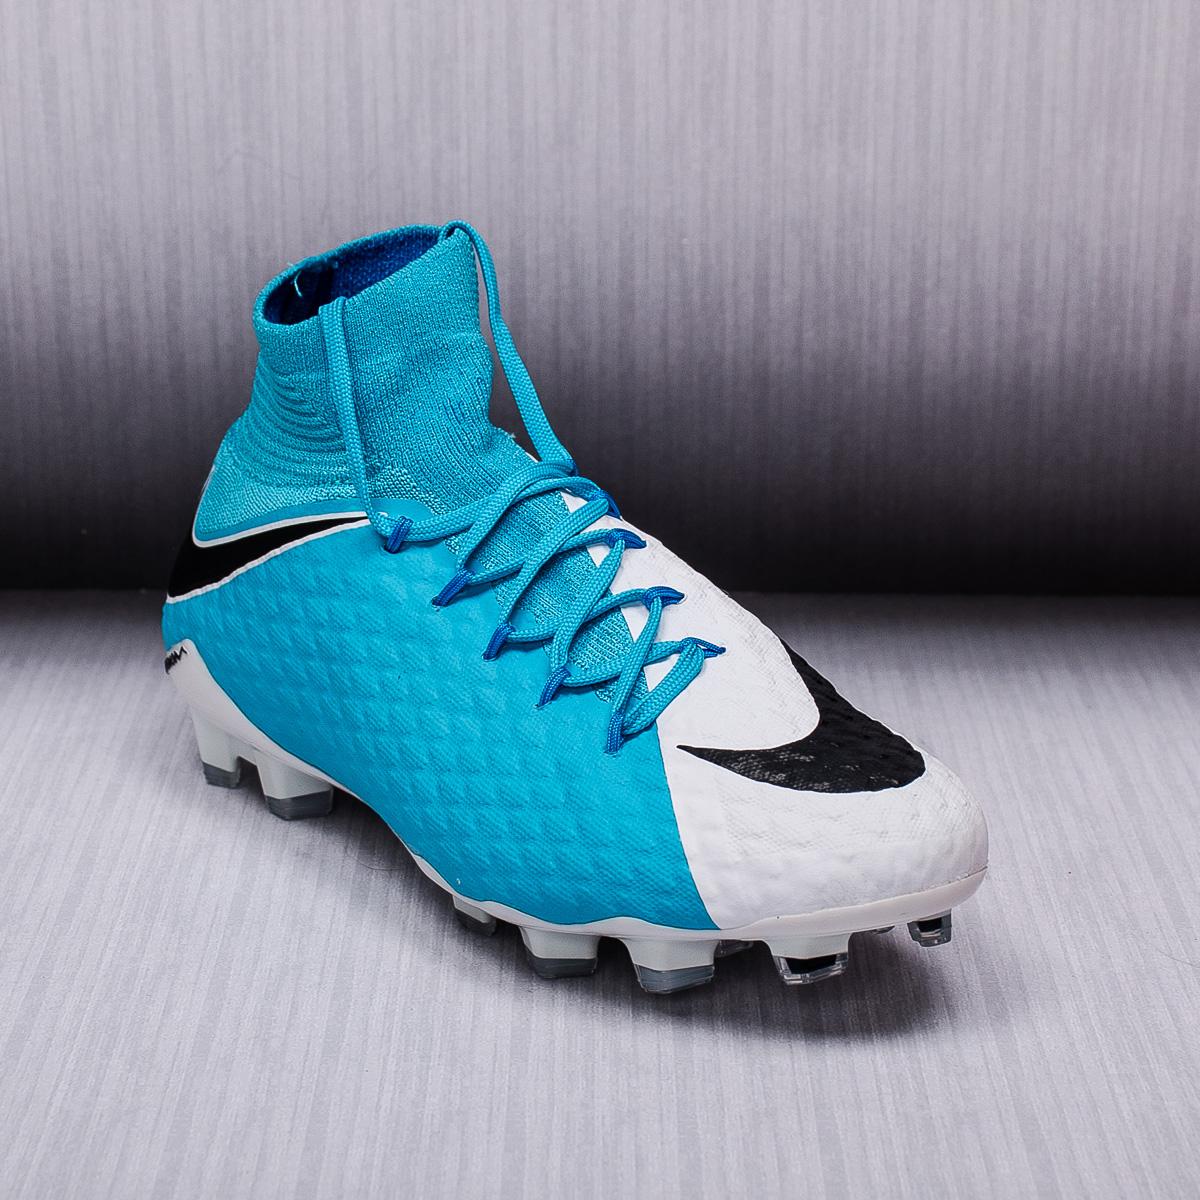 official photos 97669 8321e Nike Hypervenom Phatal III FG Soccer Cleats - Soccer Cleats Nike Football  Boots - Superfanas.lt